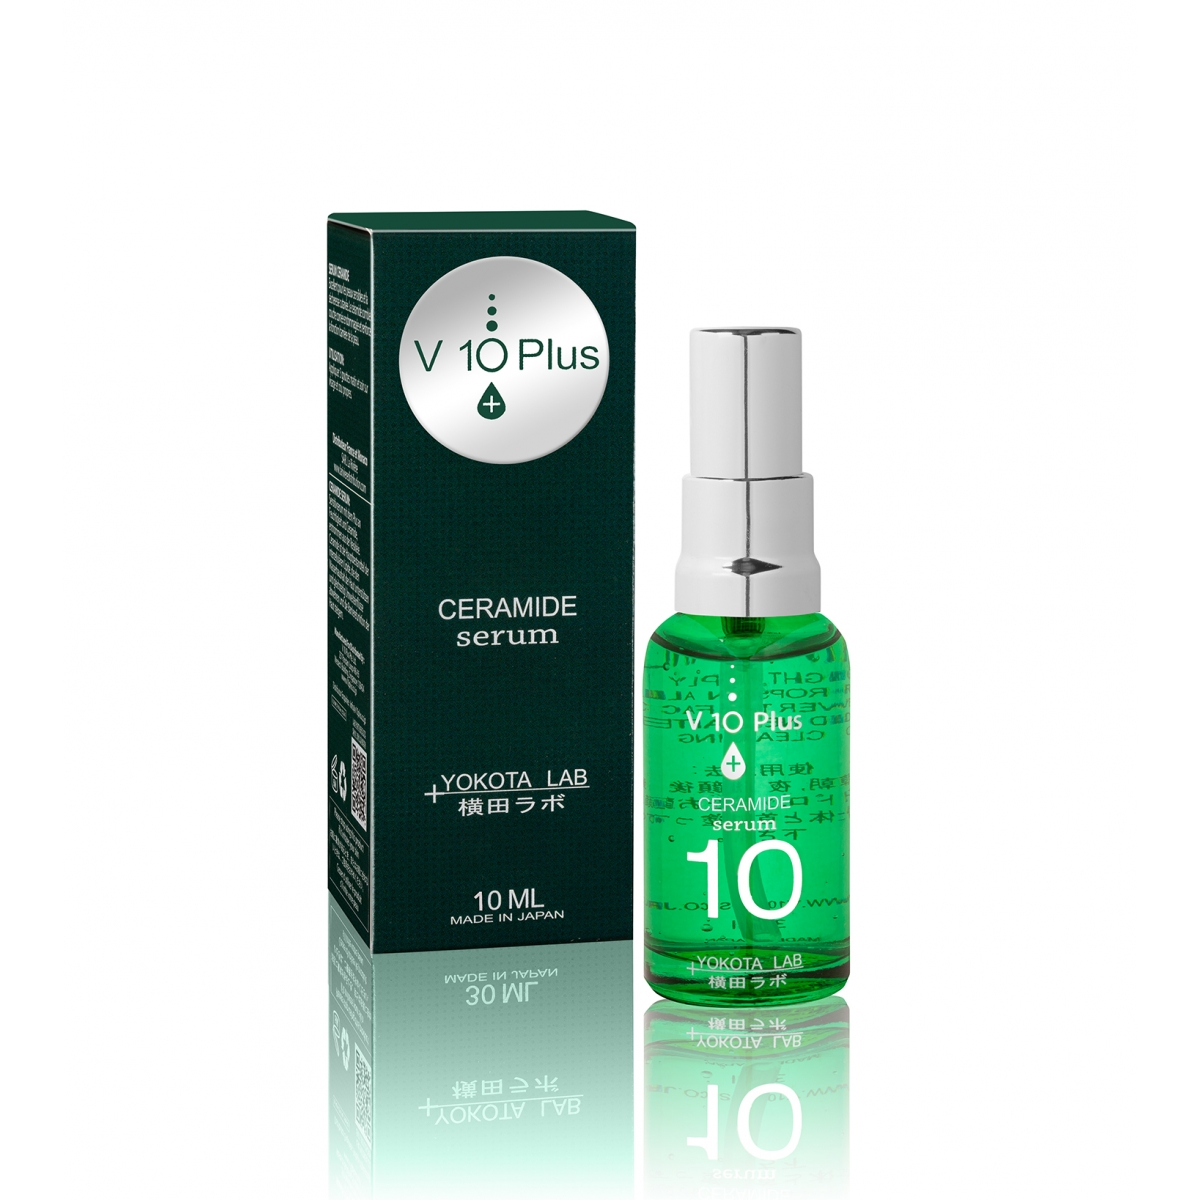 SOIN DU VISAGE - CERAMIDE SERUM V10+ (10 ml)